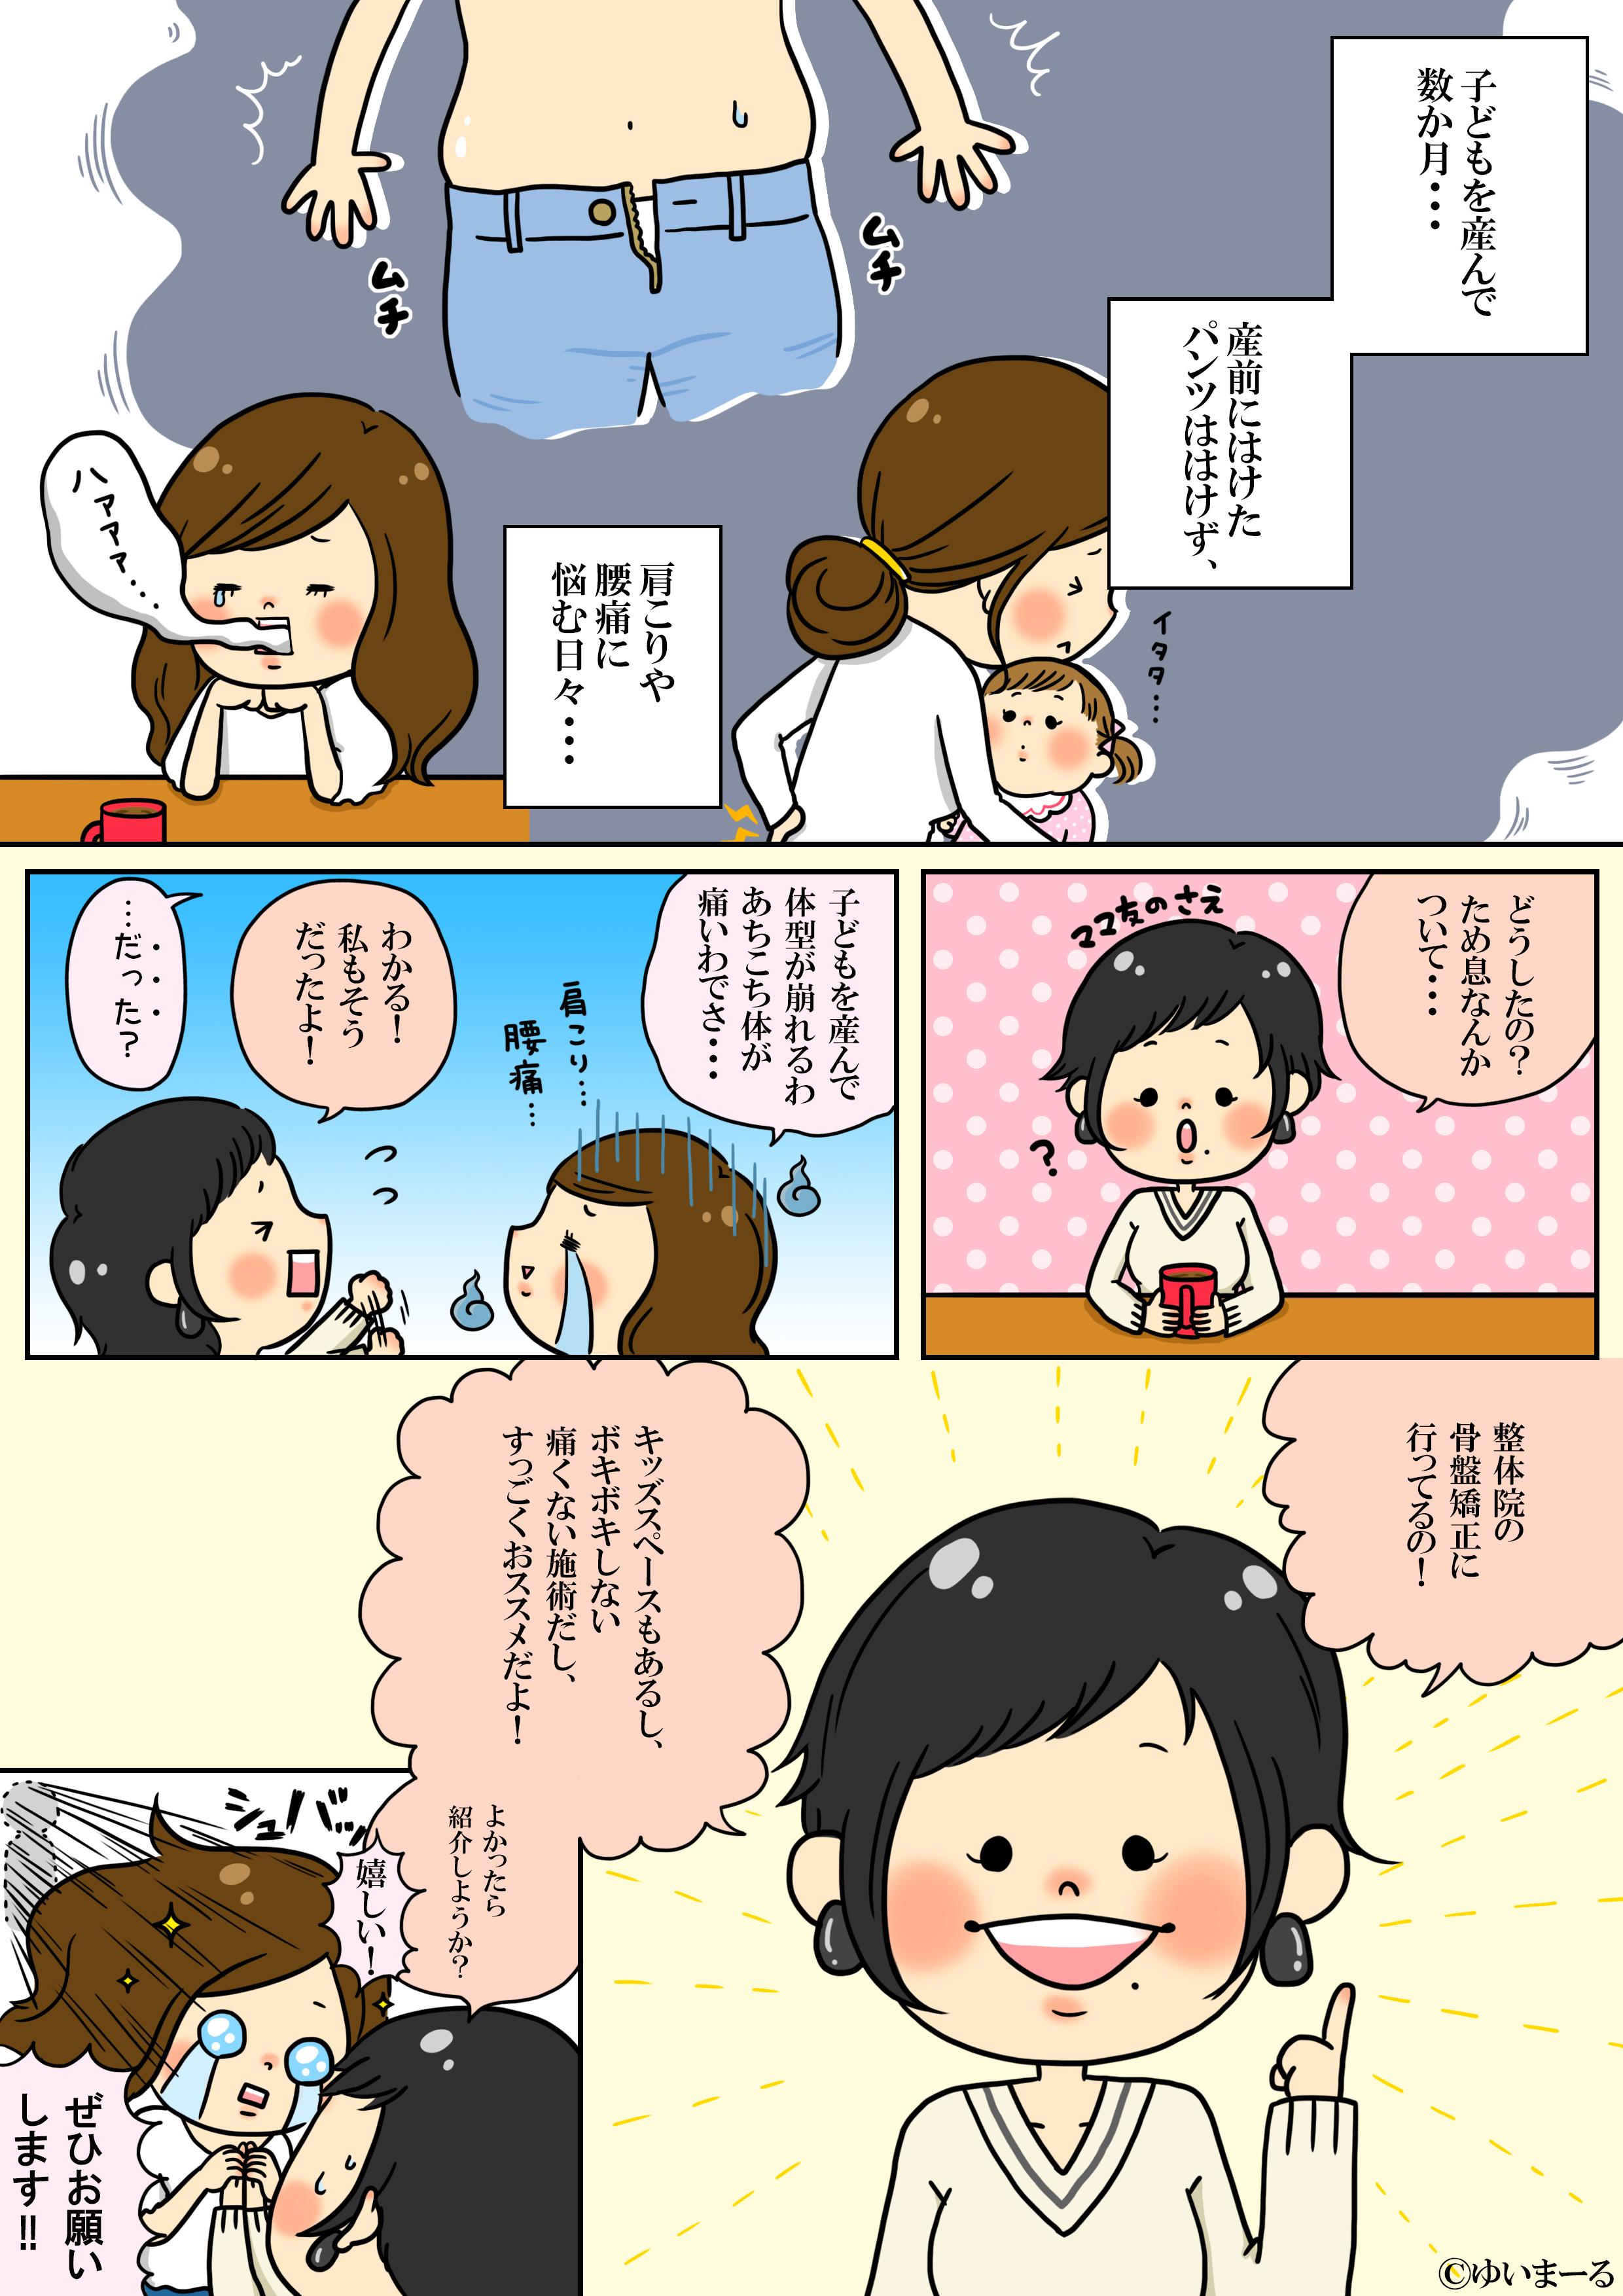 産後の骨盤矯正漫画1